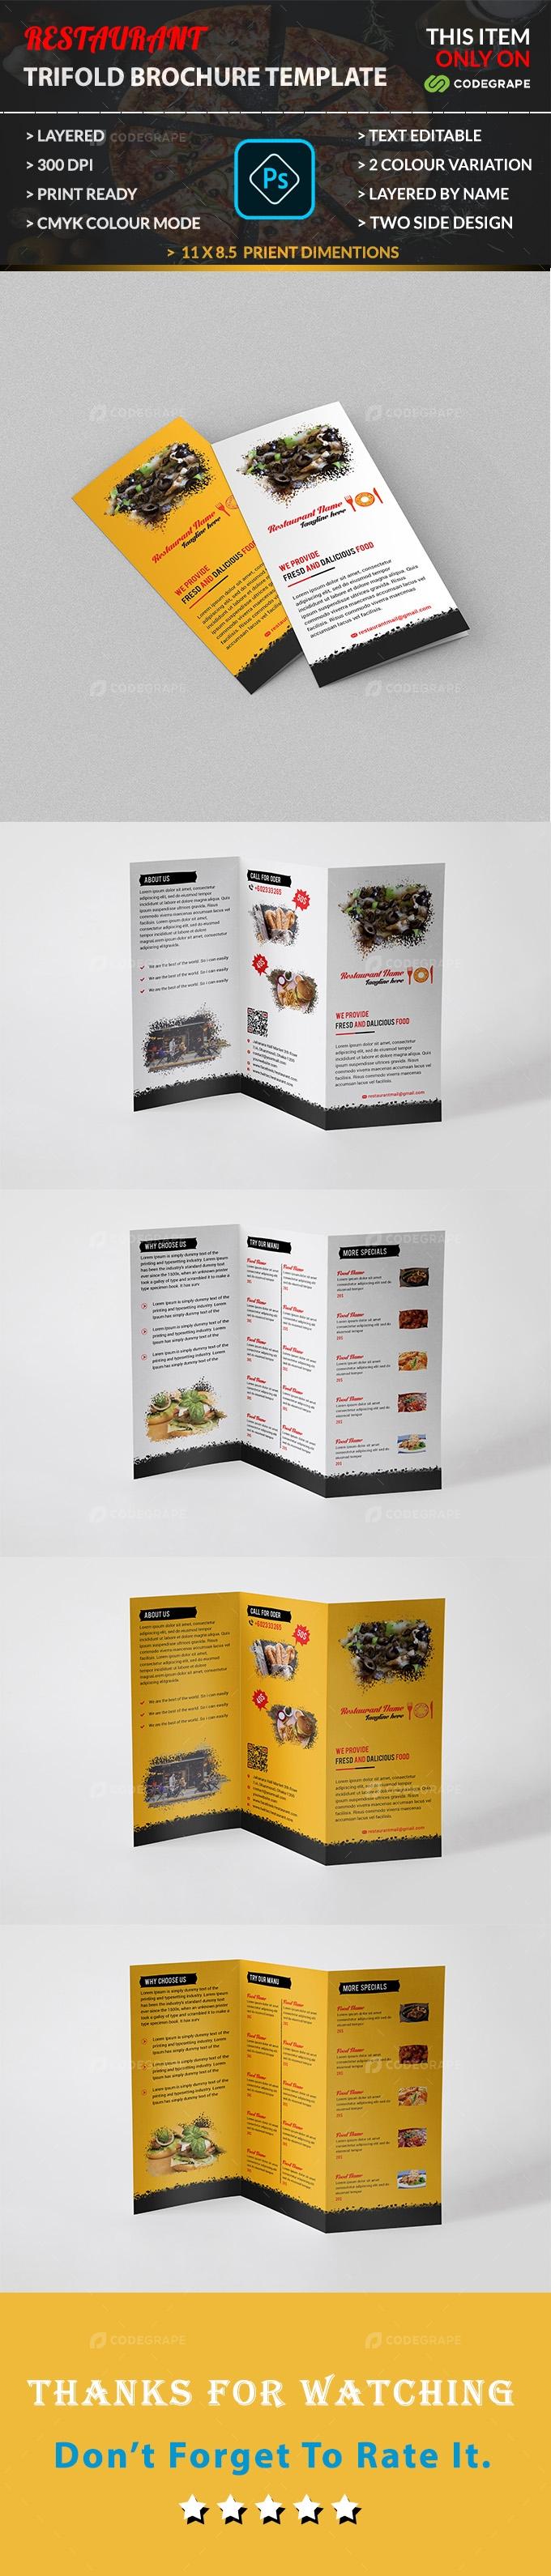 Restaurant Tri-fold Brochure Template